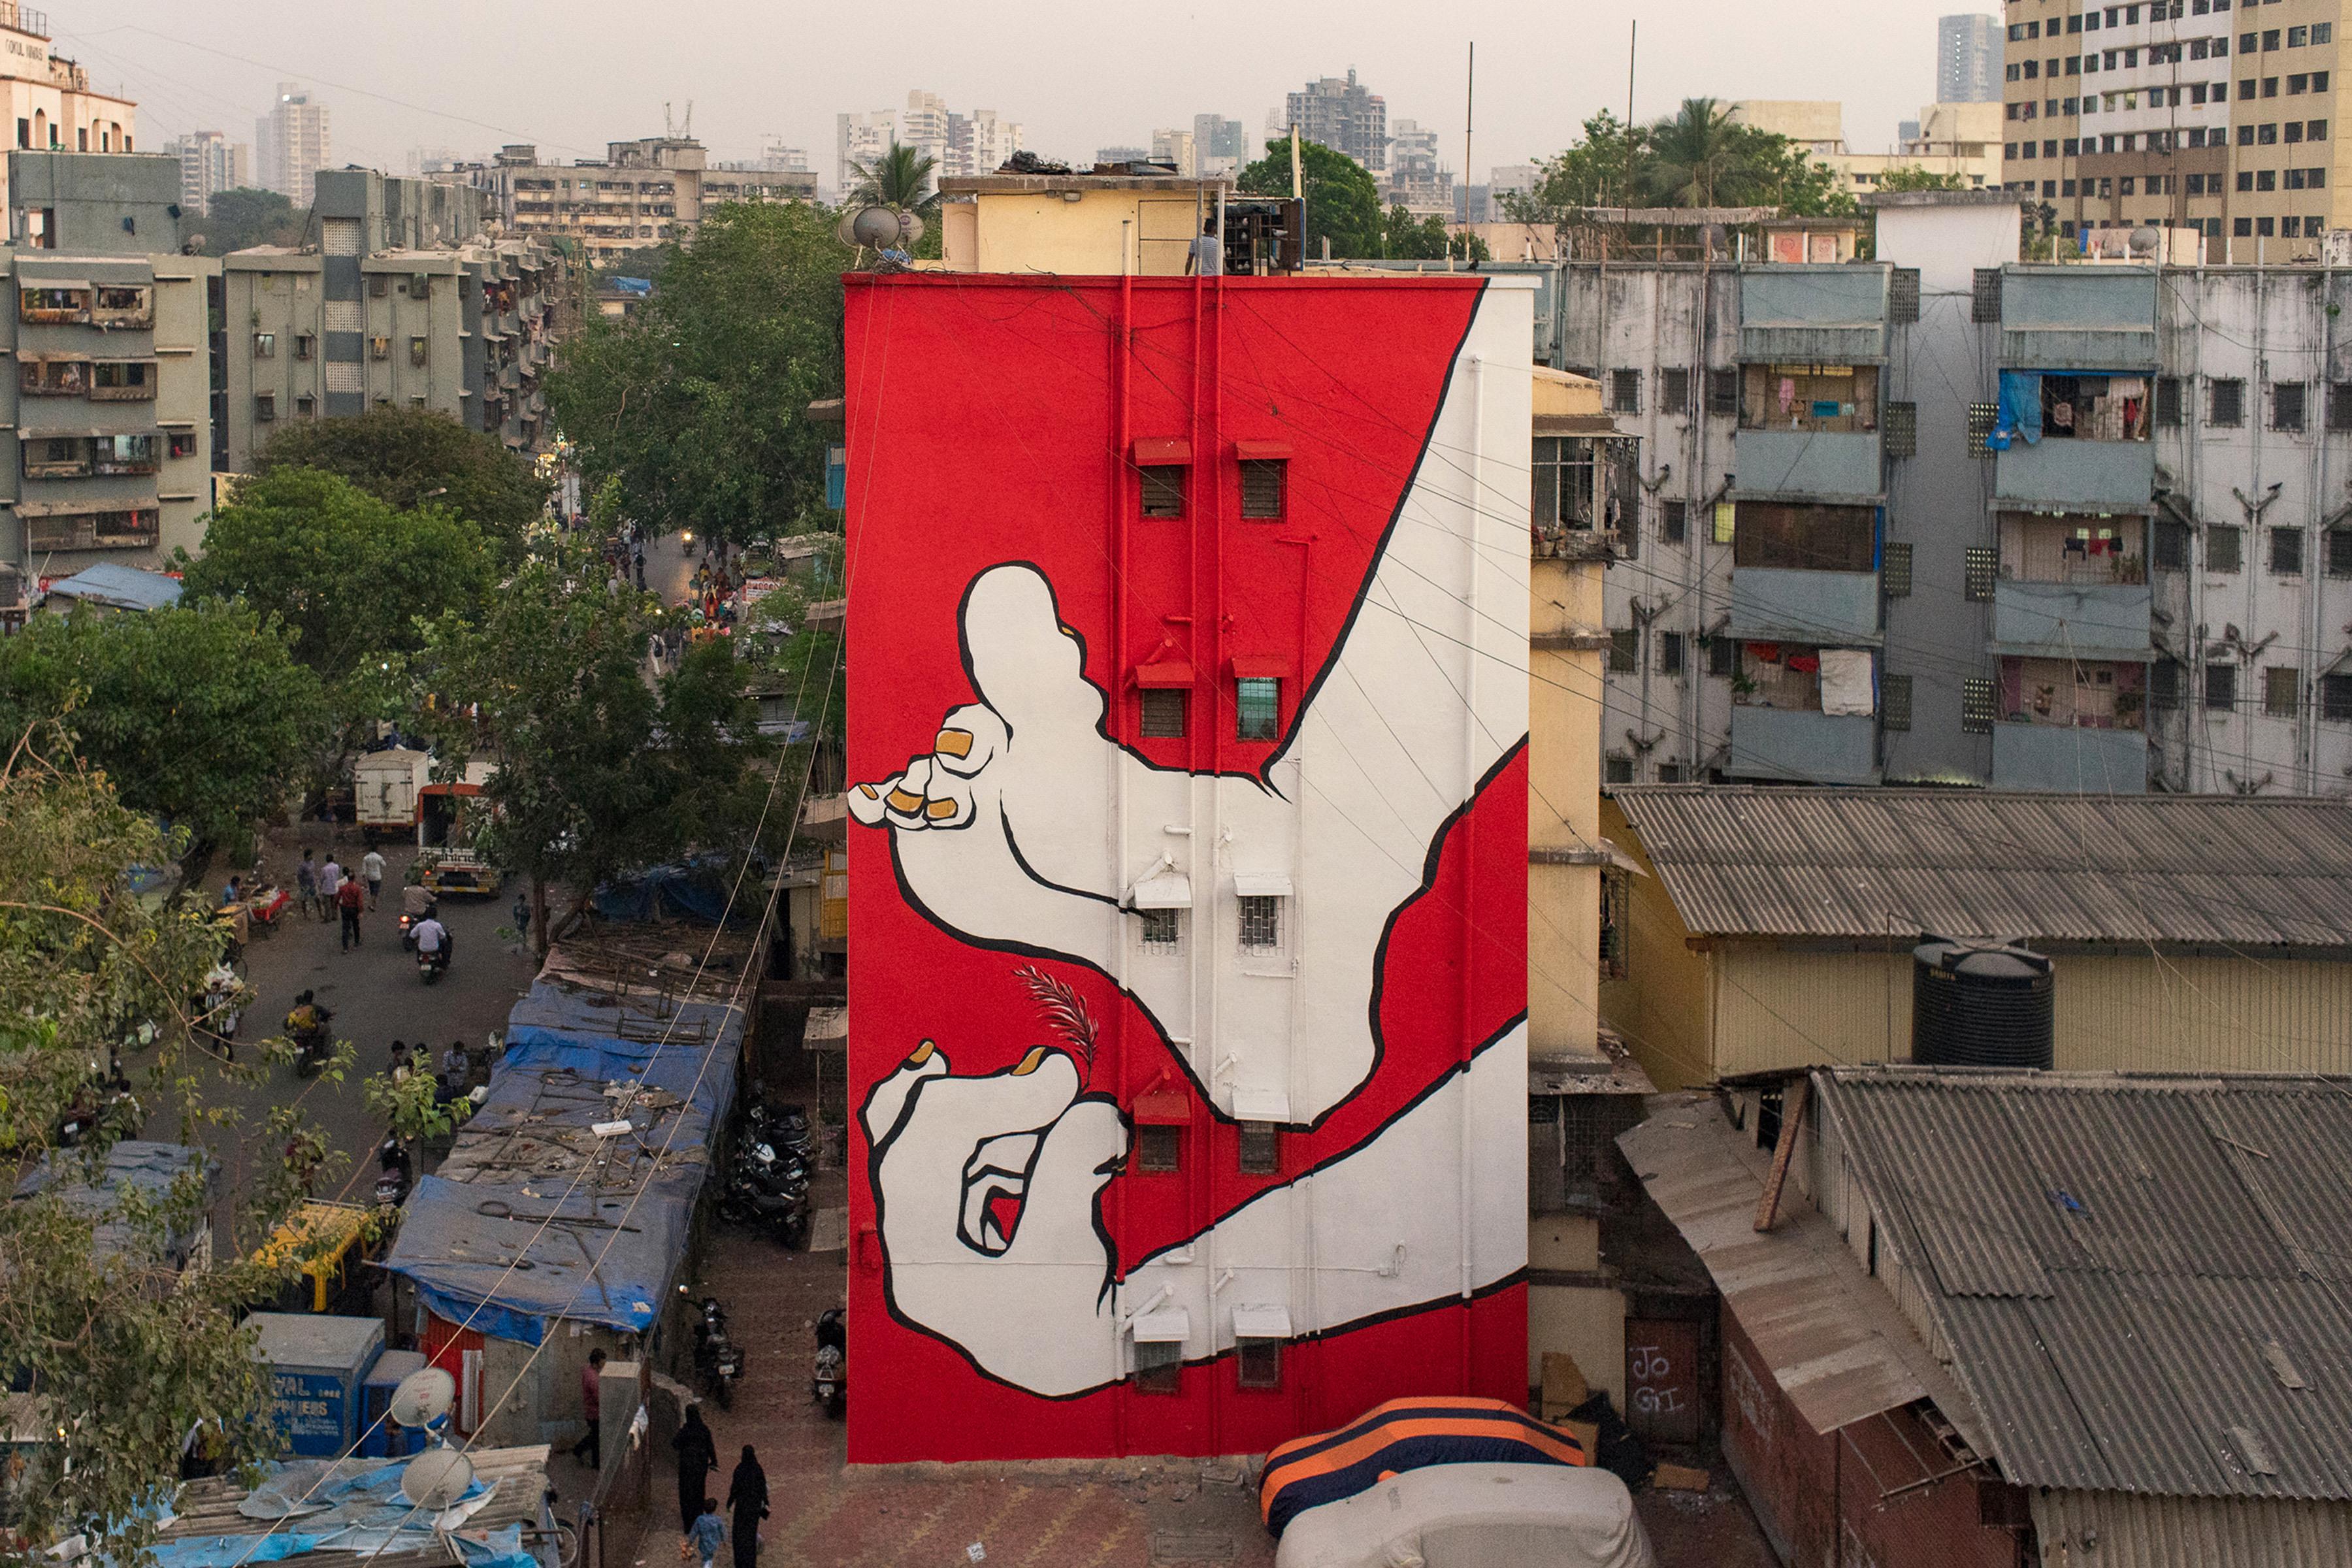 Ella Pitr Reveals Mahim E Art Dist St Art Mumbai 2018 1